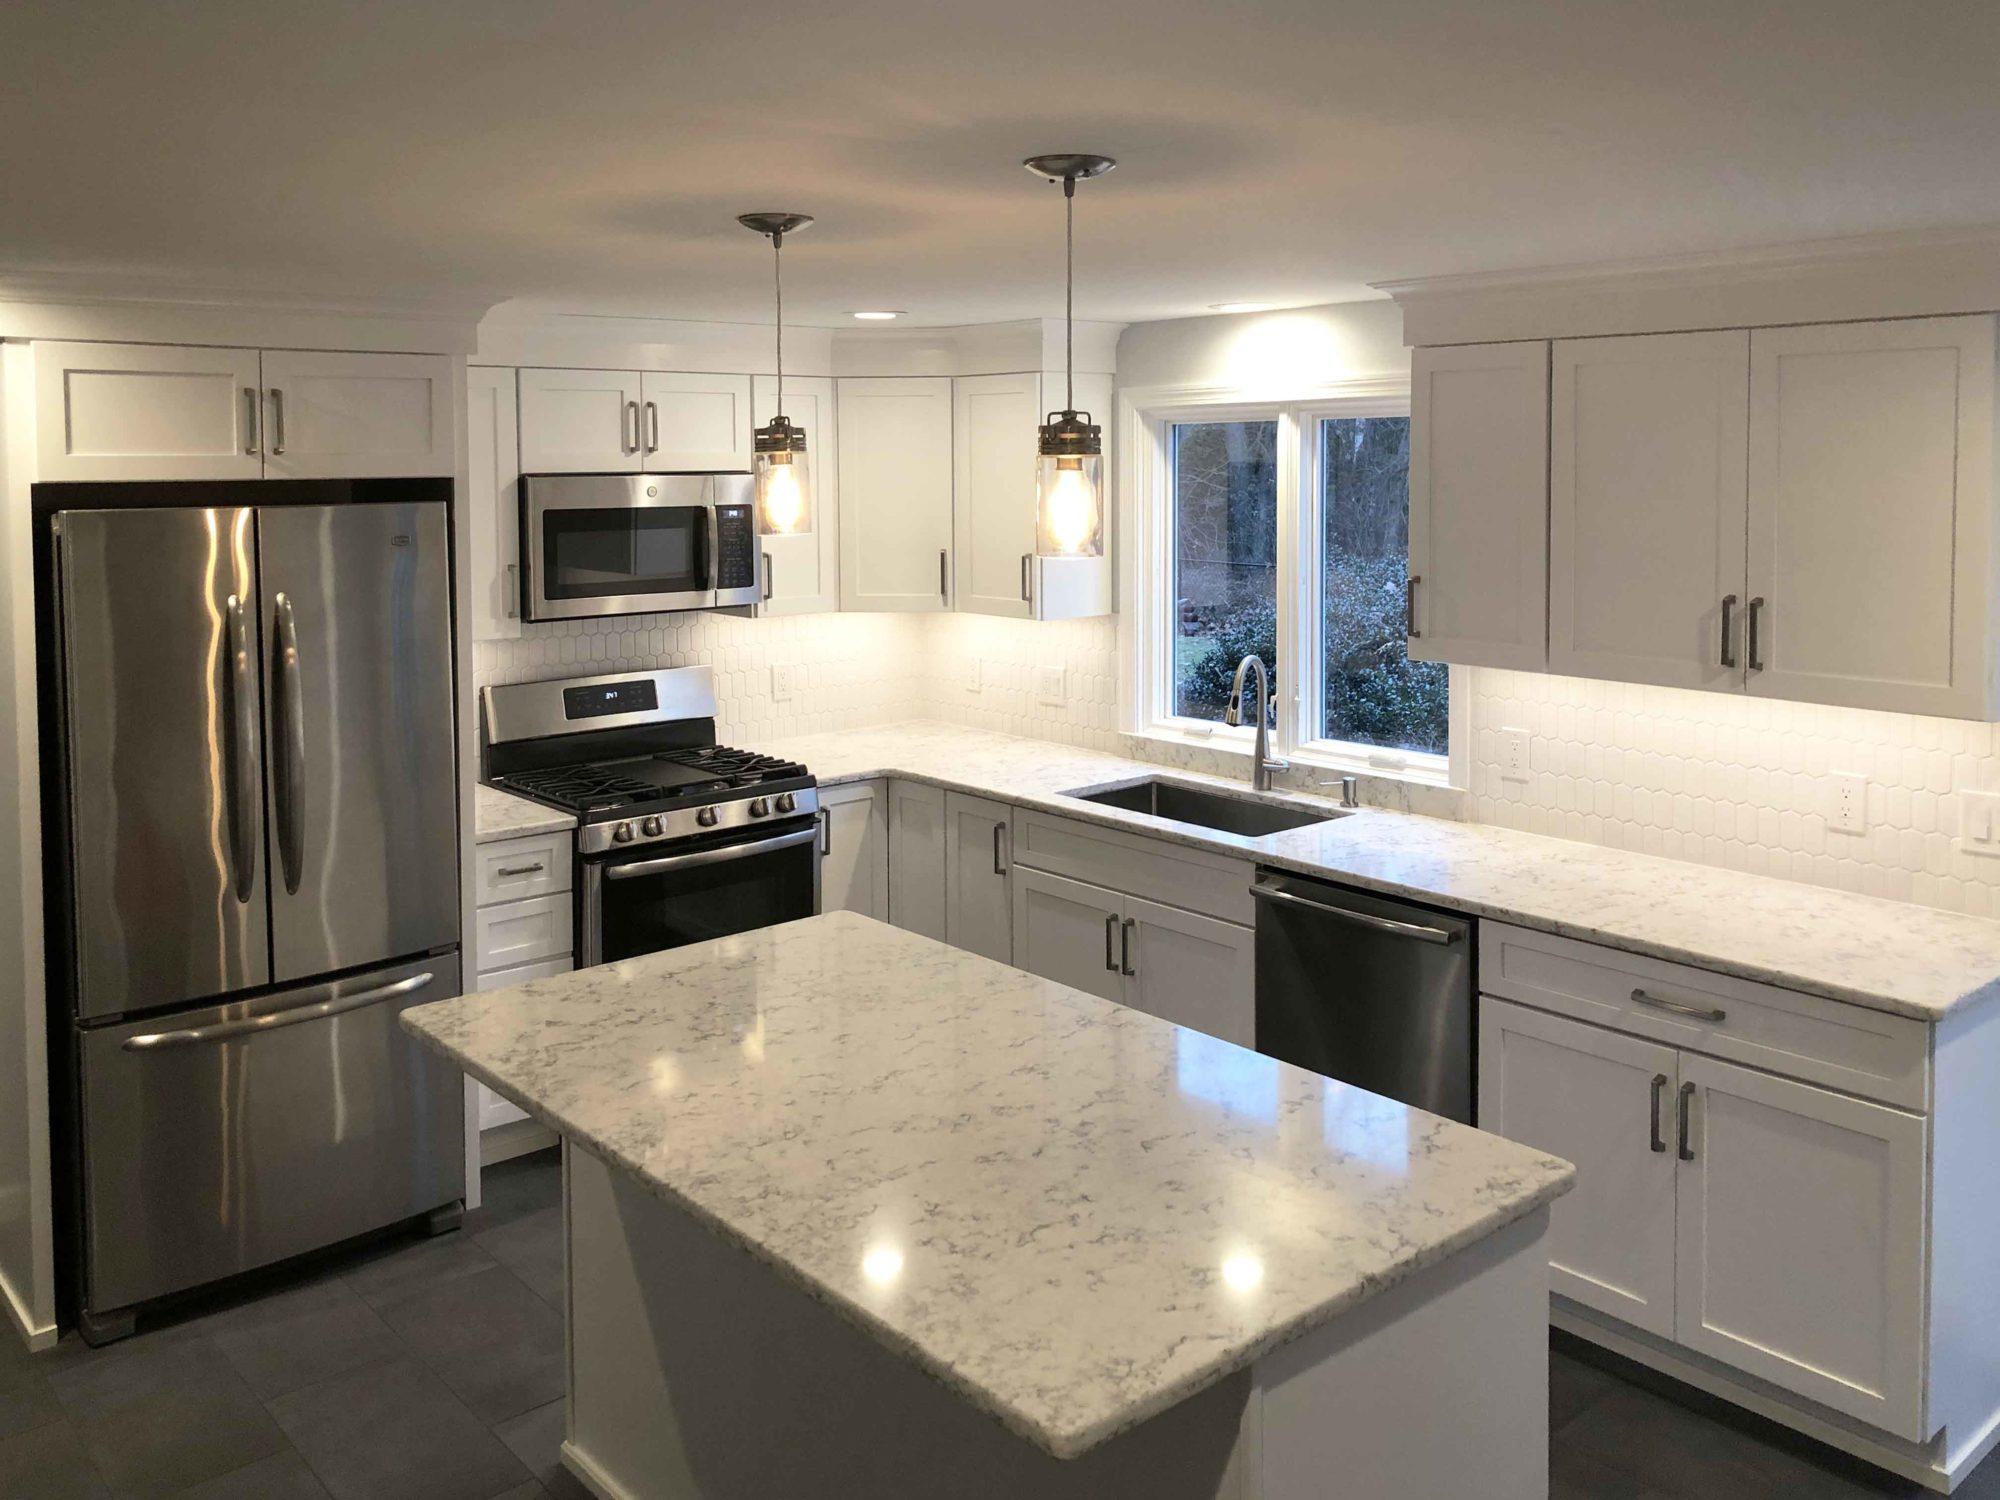 Legacy Construction installs a Medallion Kitchen in Longmeadow, MA